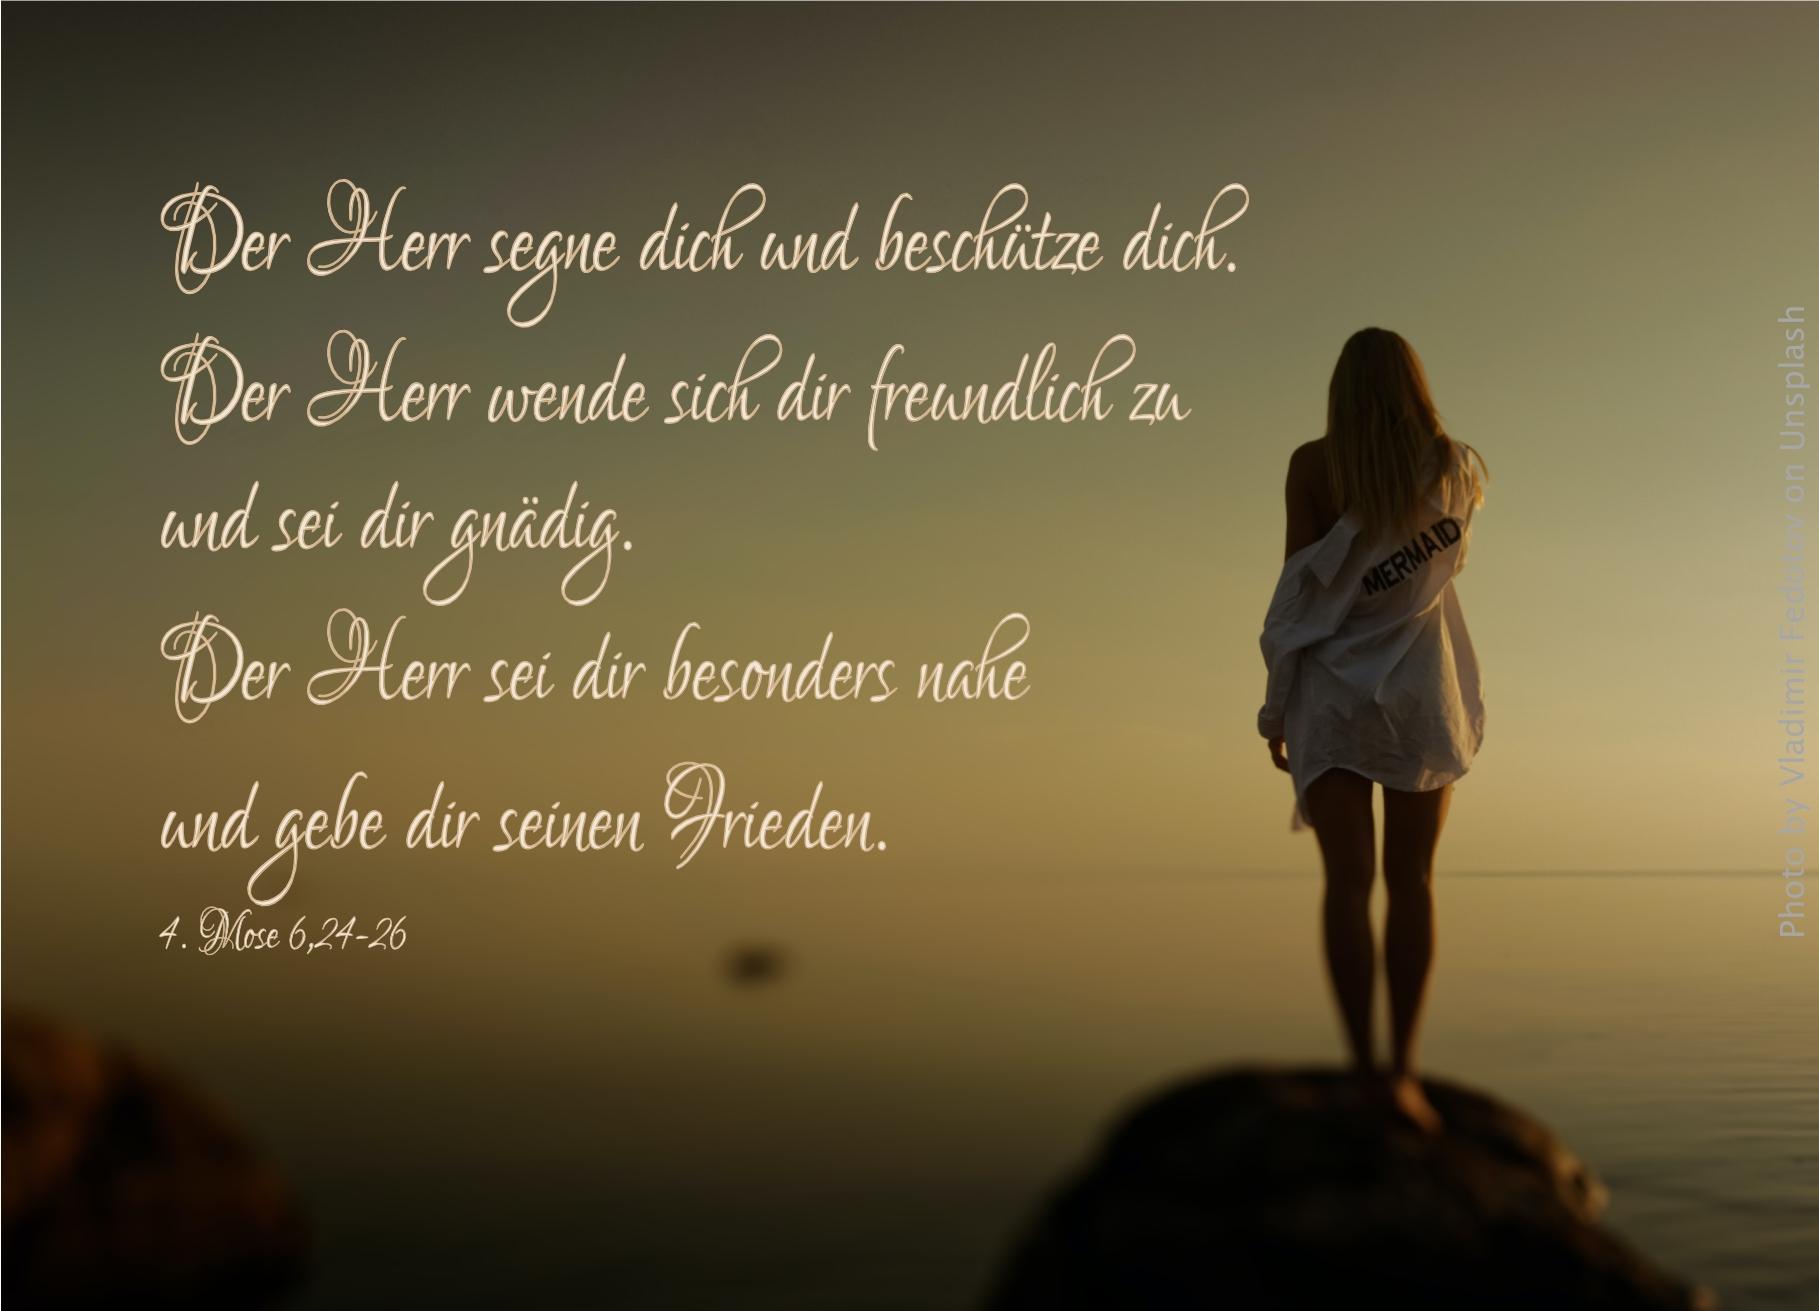 "alt=""frau_auf_felsen_vor_weitem_meer_erwartet_bibelhoerbuch_steuern_fuer_den_kaiser"""